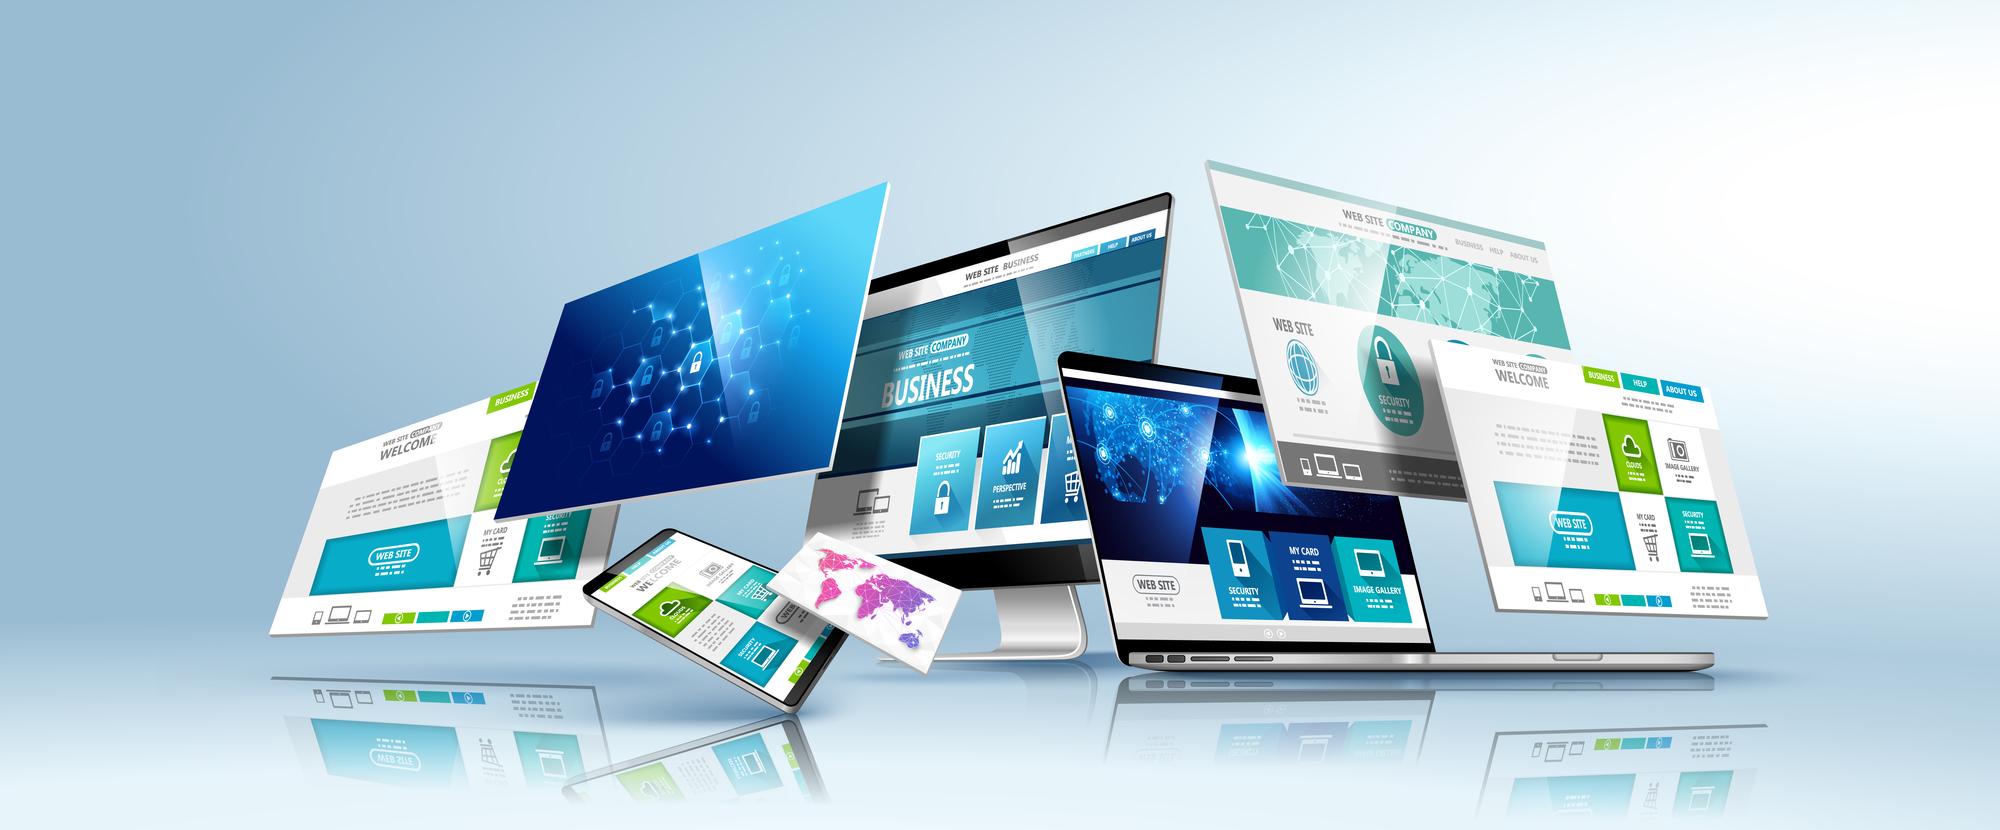 Screen shots of mobile and desktop design